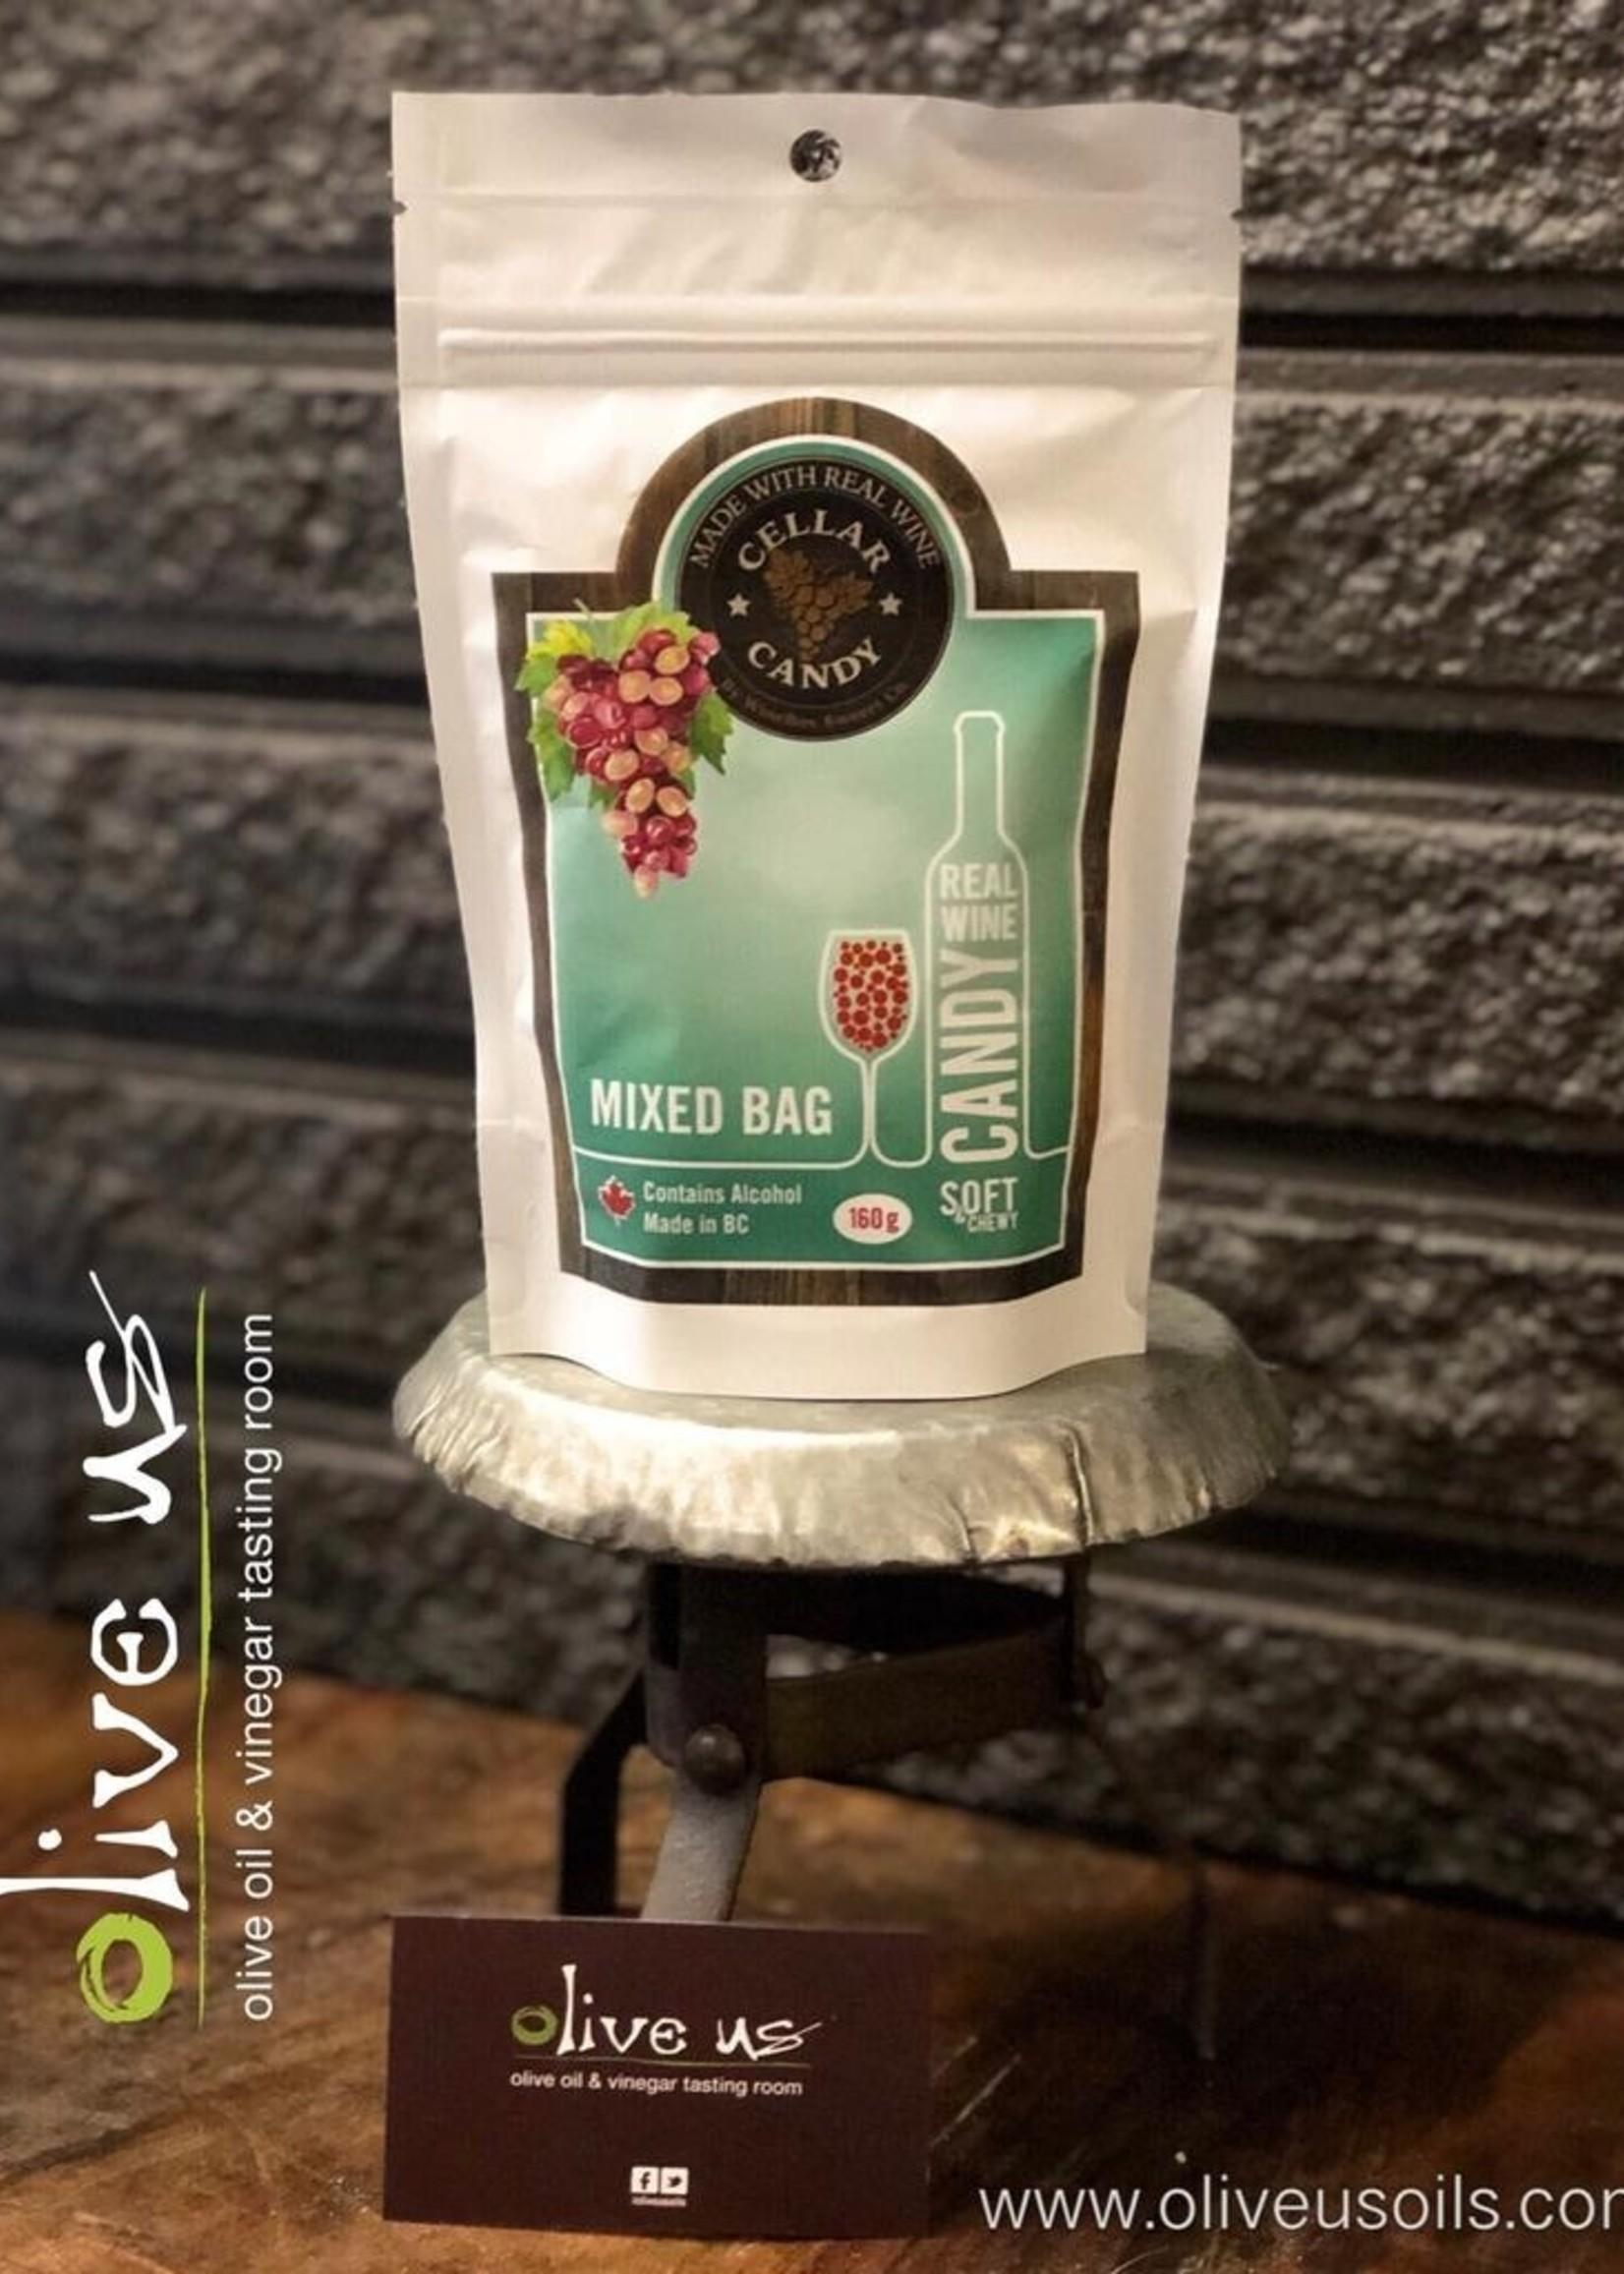 Wine Cellar Wine Gums Mixed Bag160g